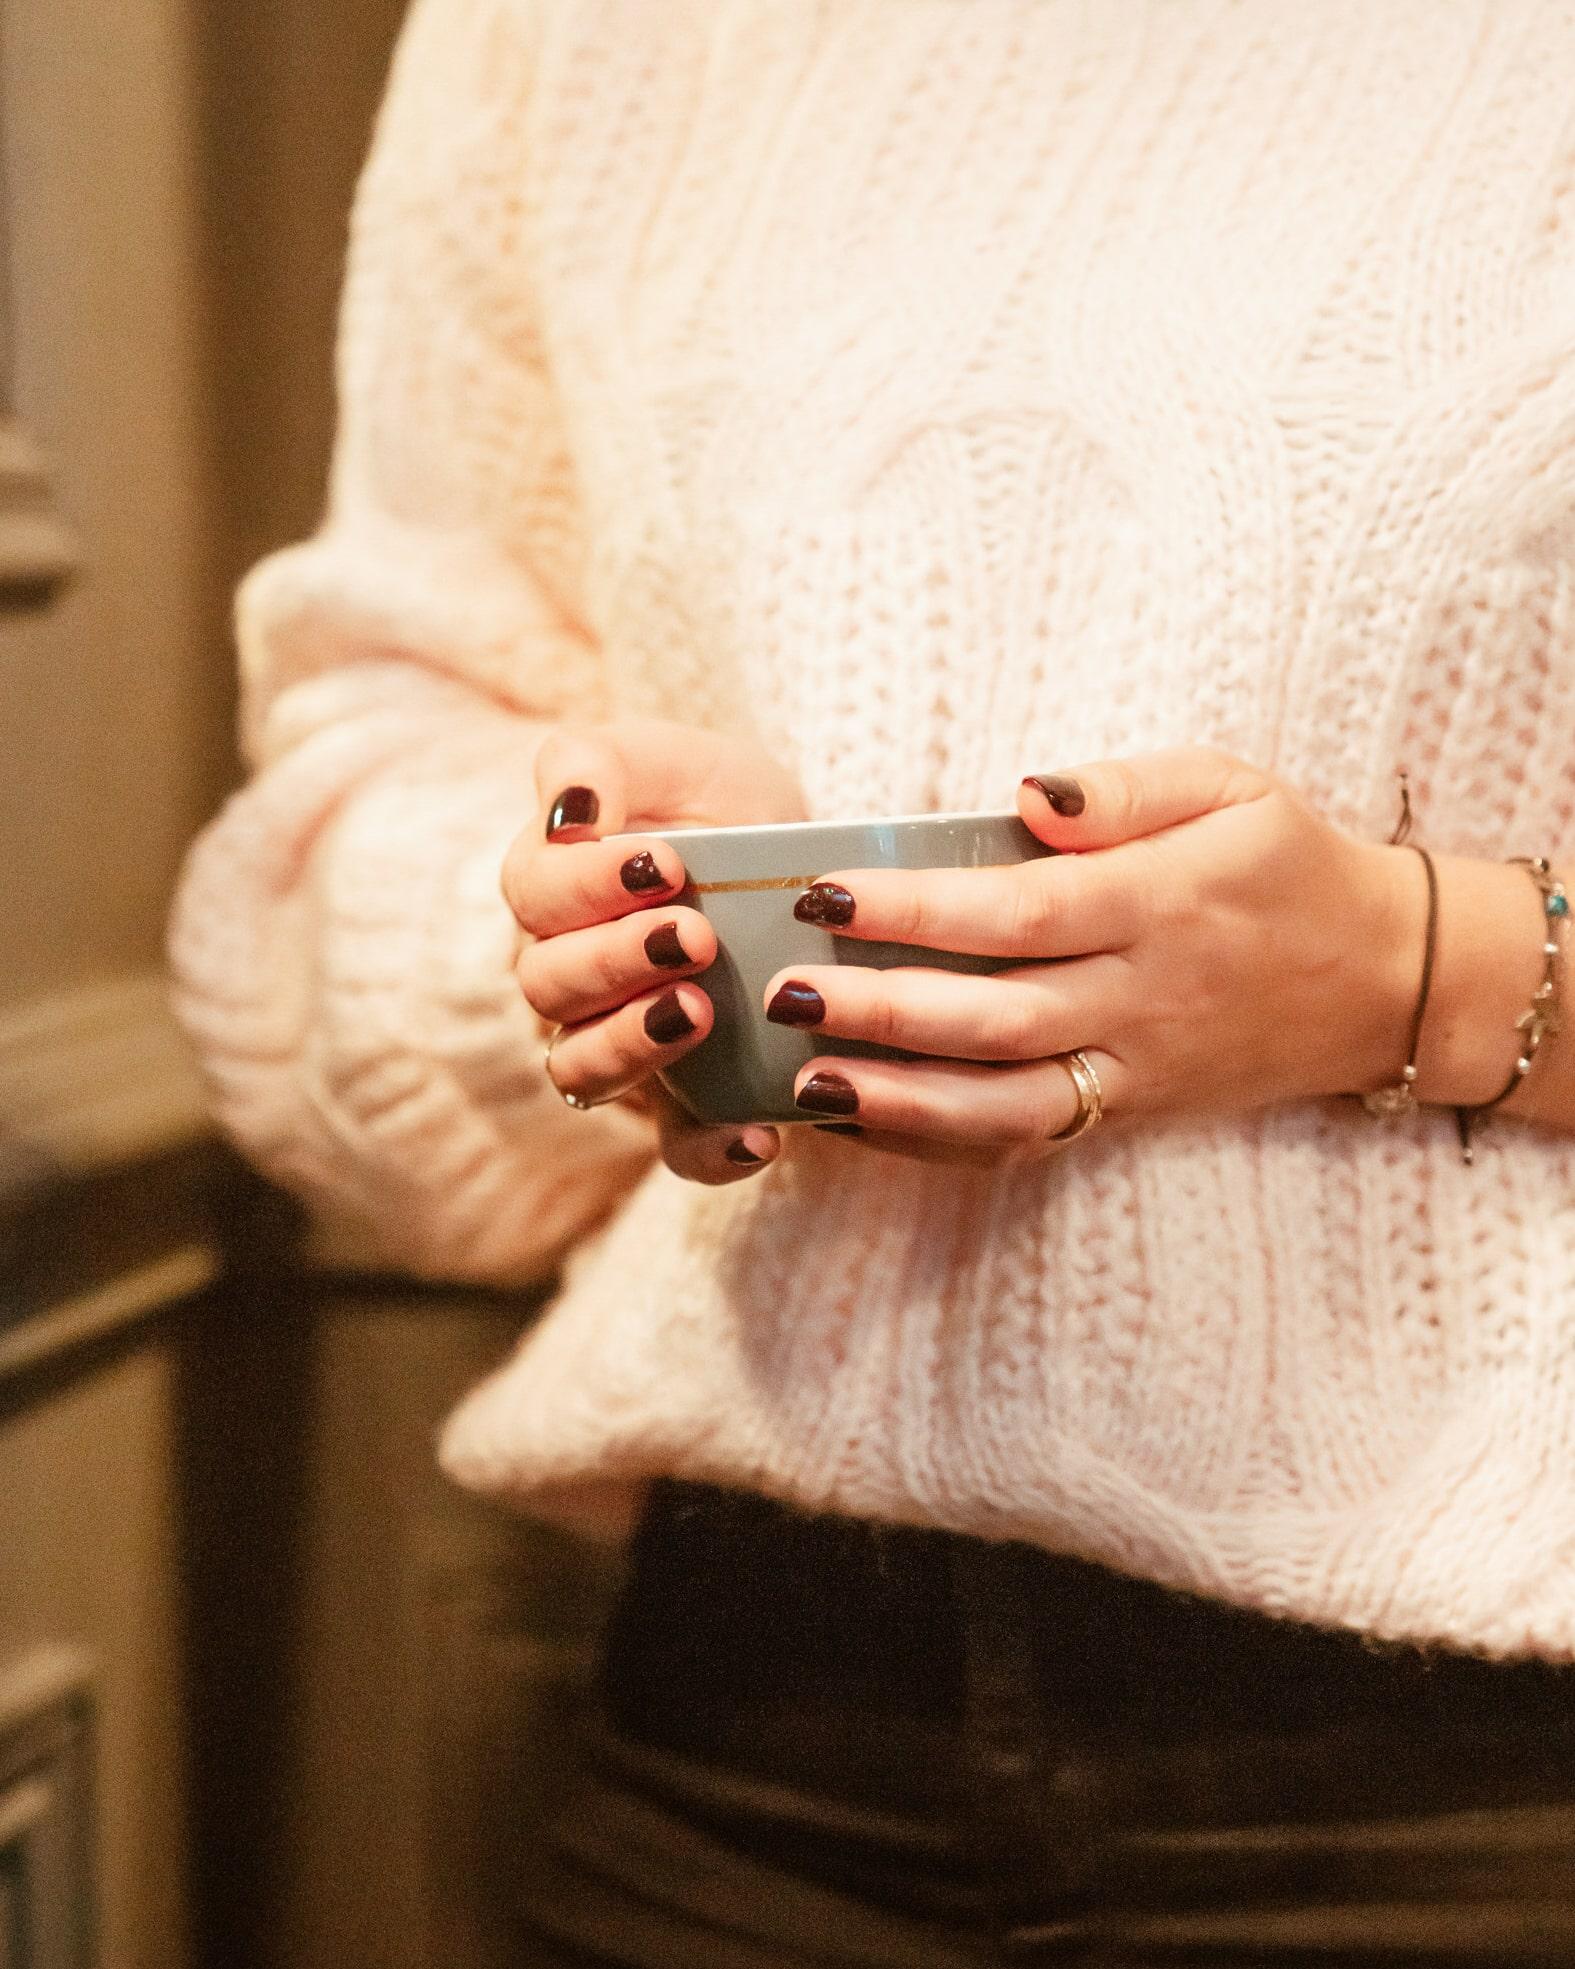 Detail of a Zara Soft Pink Knitwear